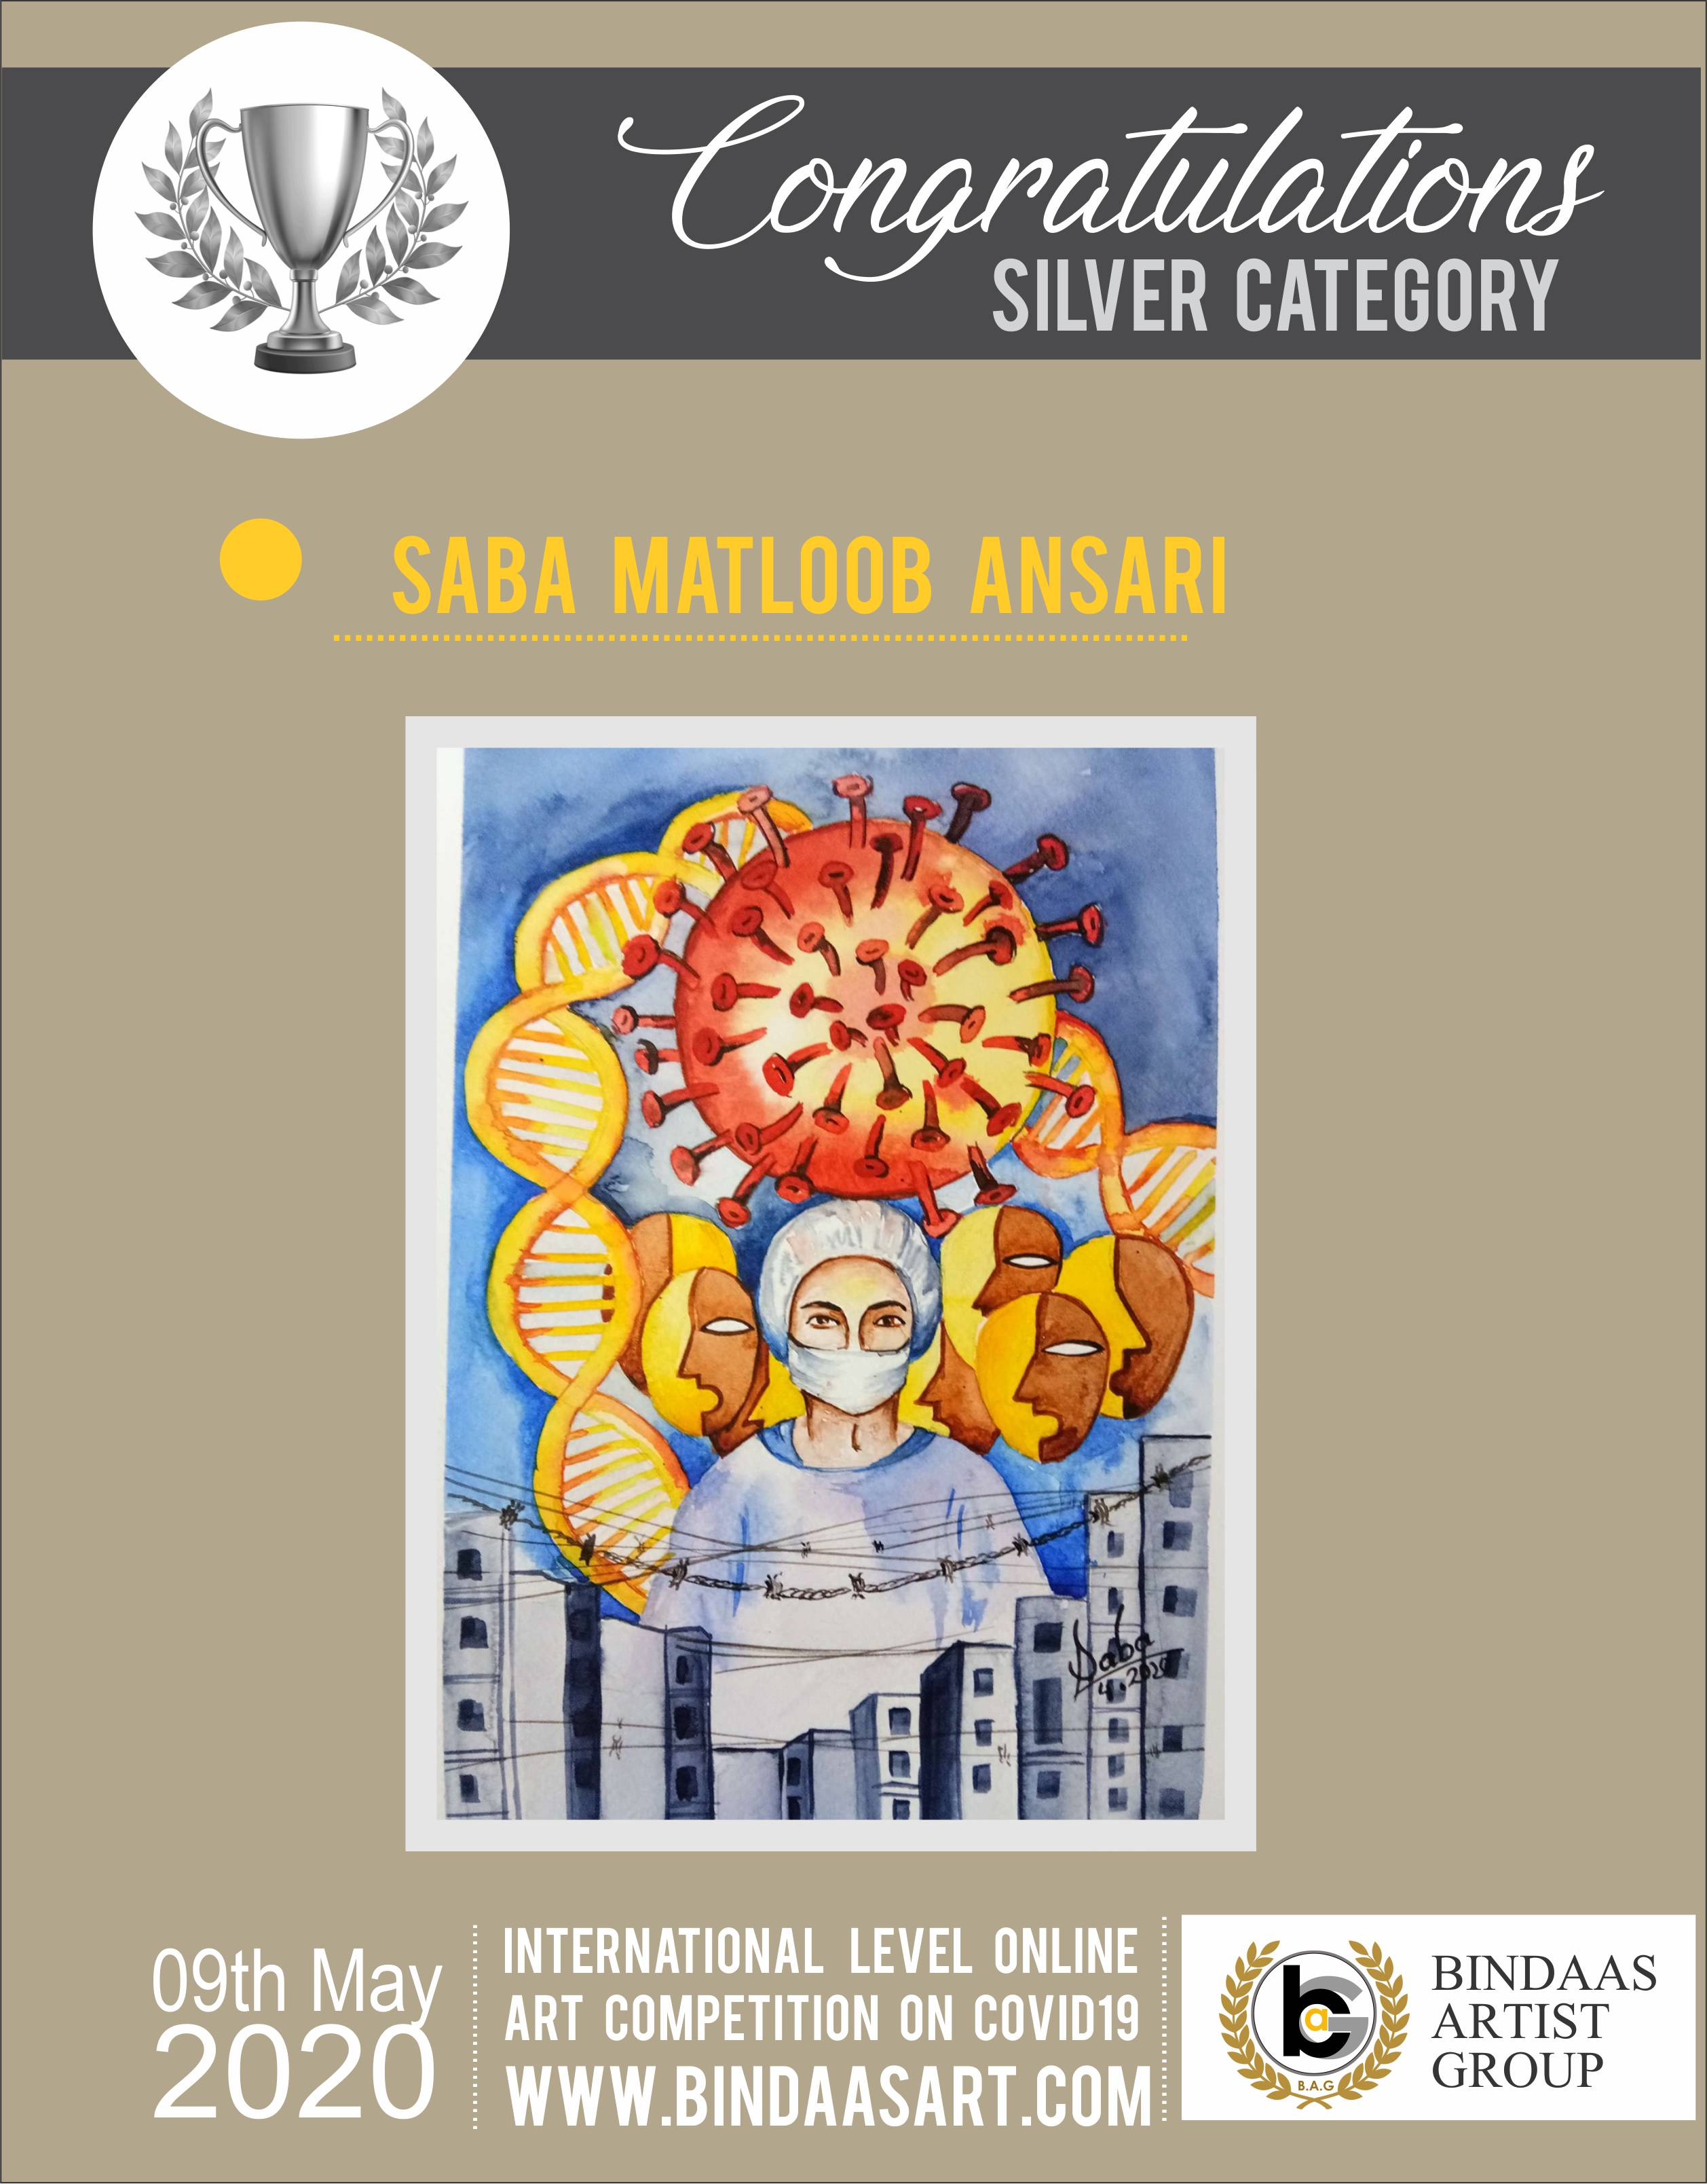 Saba Matloob Ansari